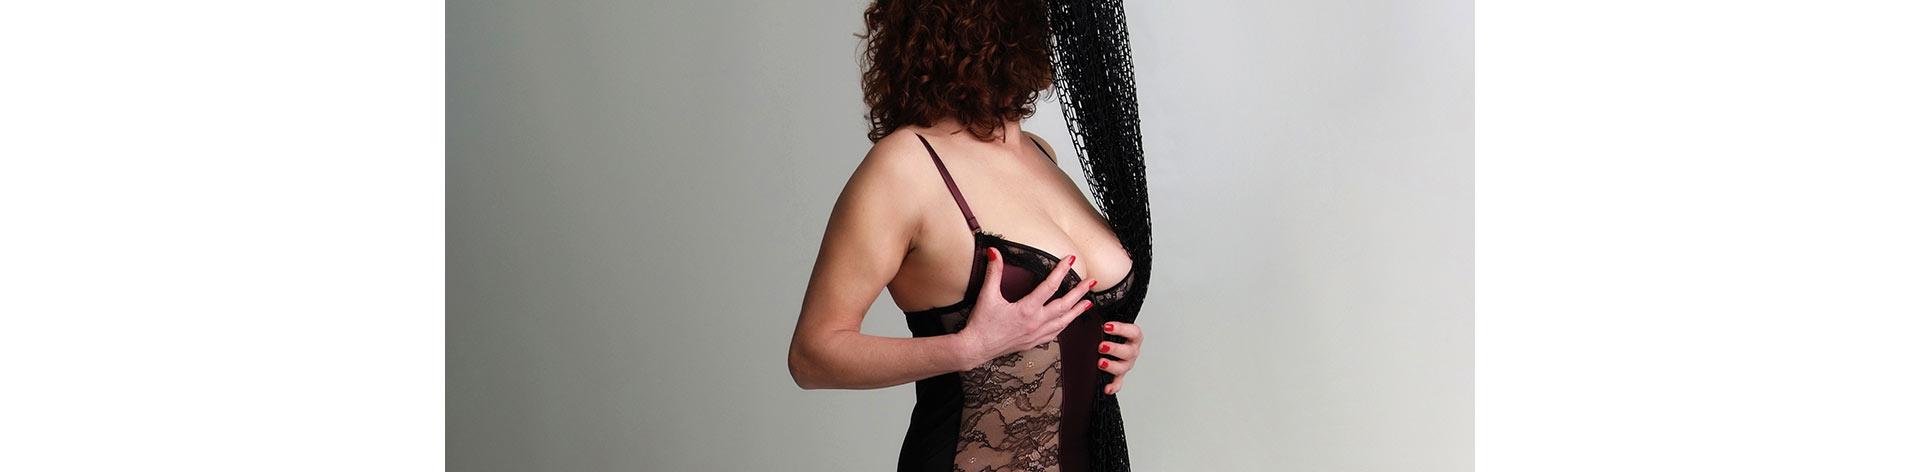 mature-escort-shropshire